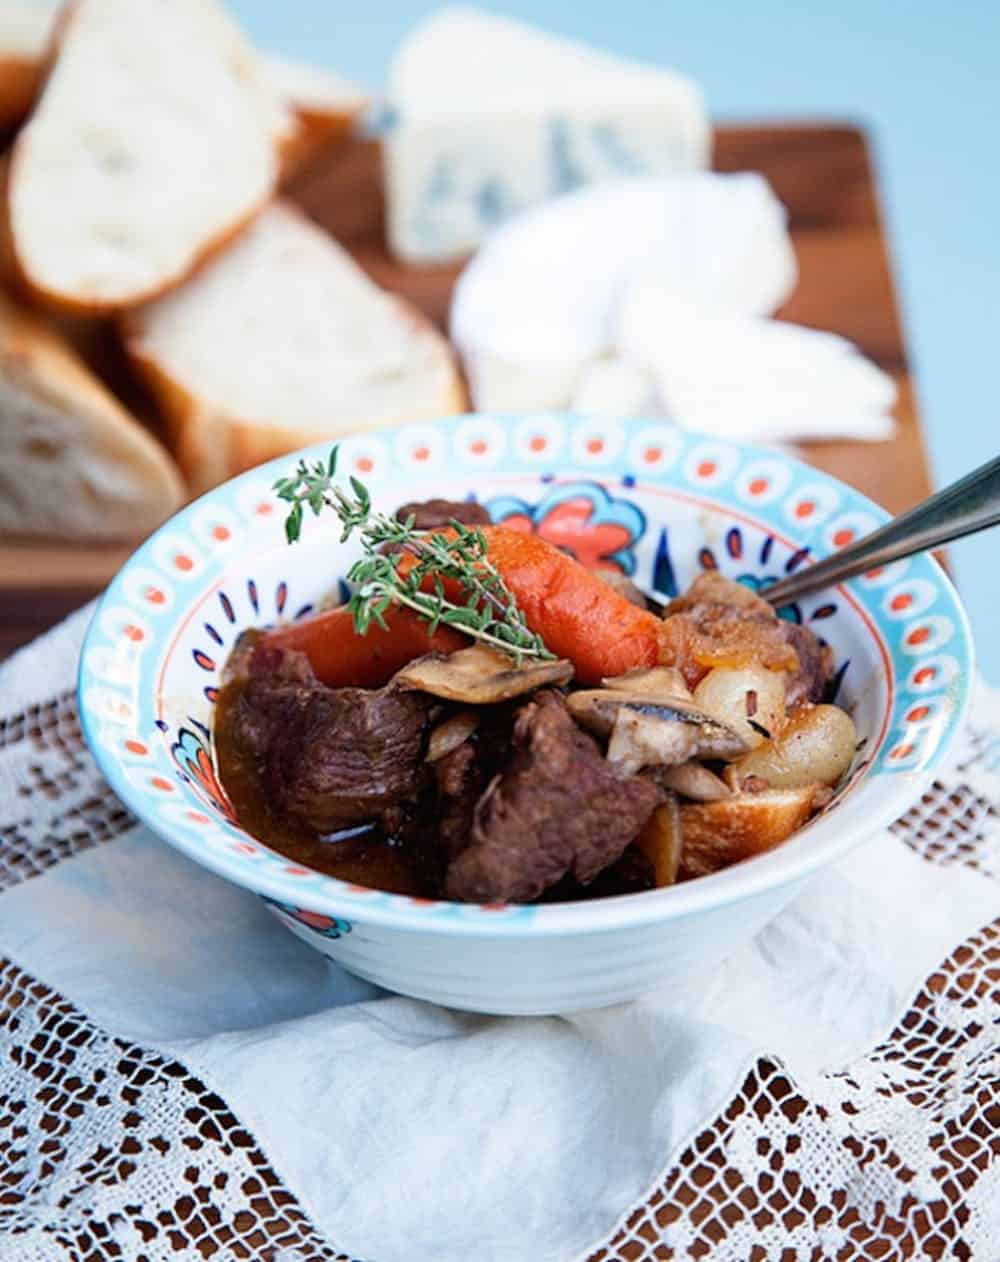 Beef bourguigon